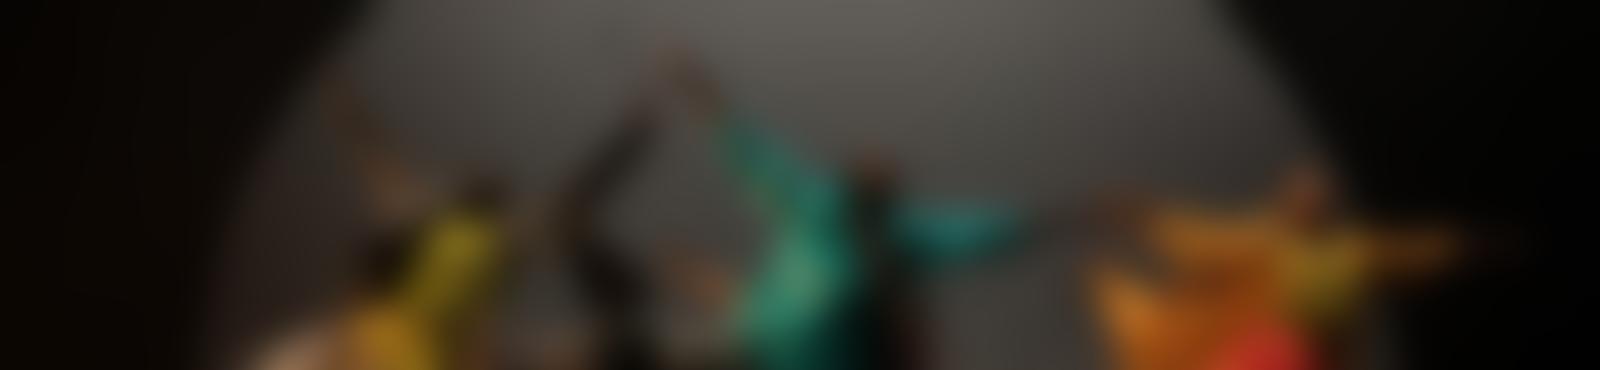 Blurred 28cf8041 27d0 4ad8 a258 41b554c7546e